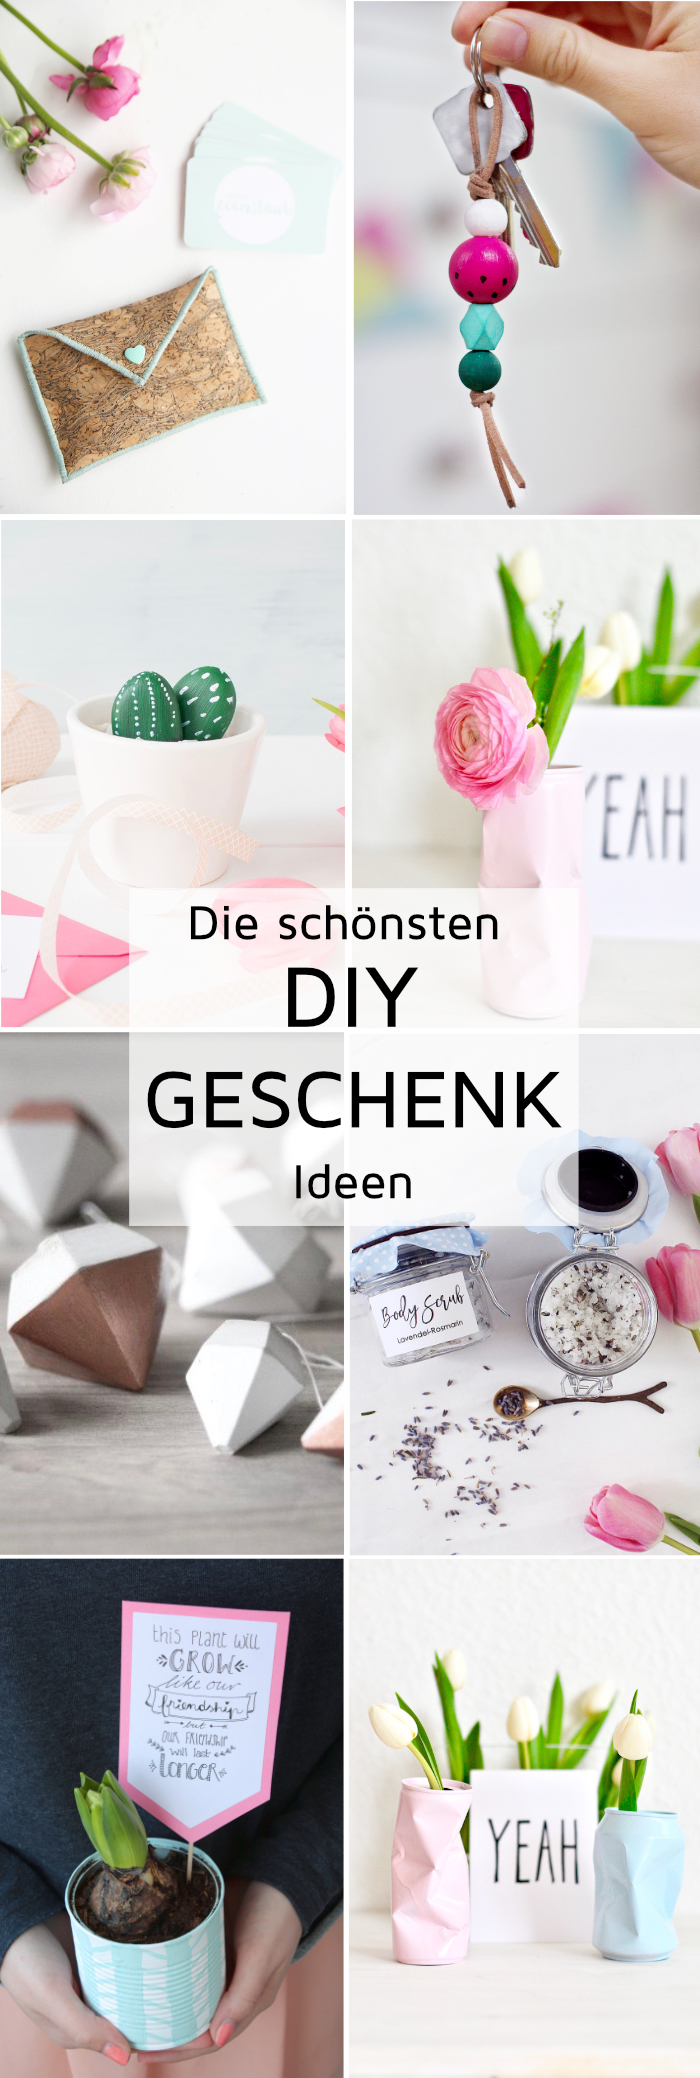 diy geschenke kreative geschenkideen zum selbermachen. Black Bedroom Furniture Sets. Home Design Ideas